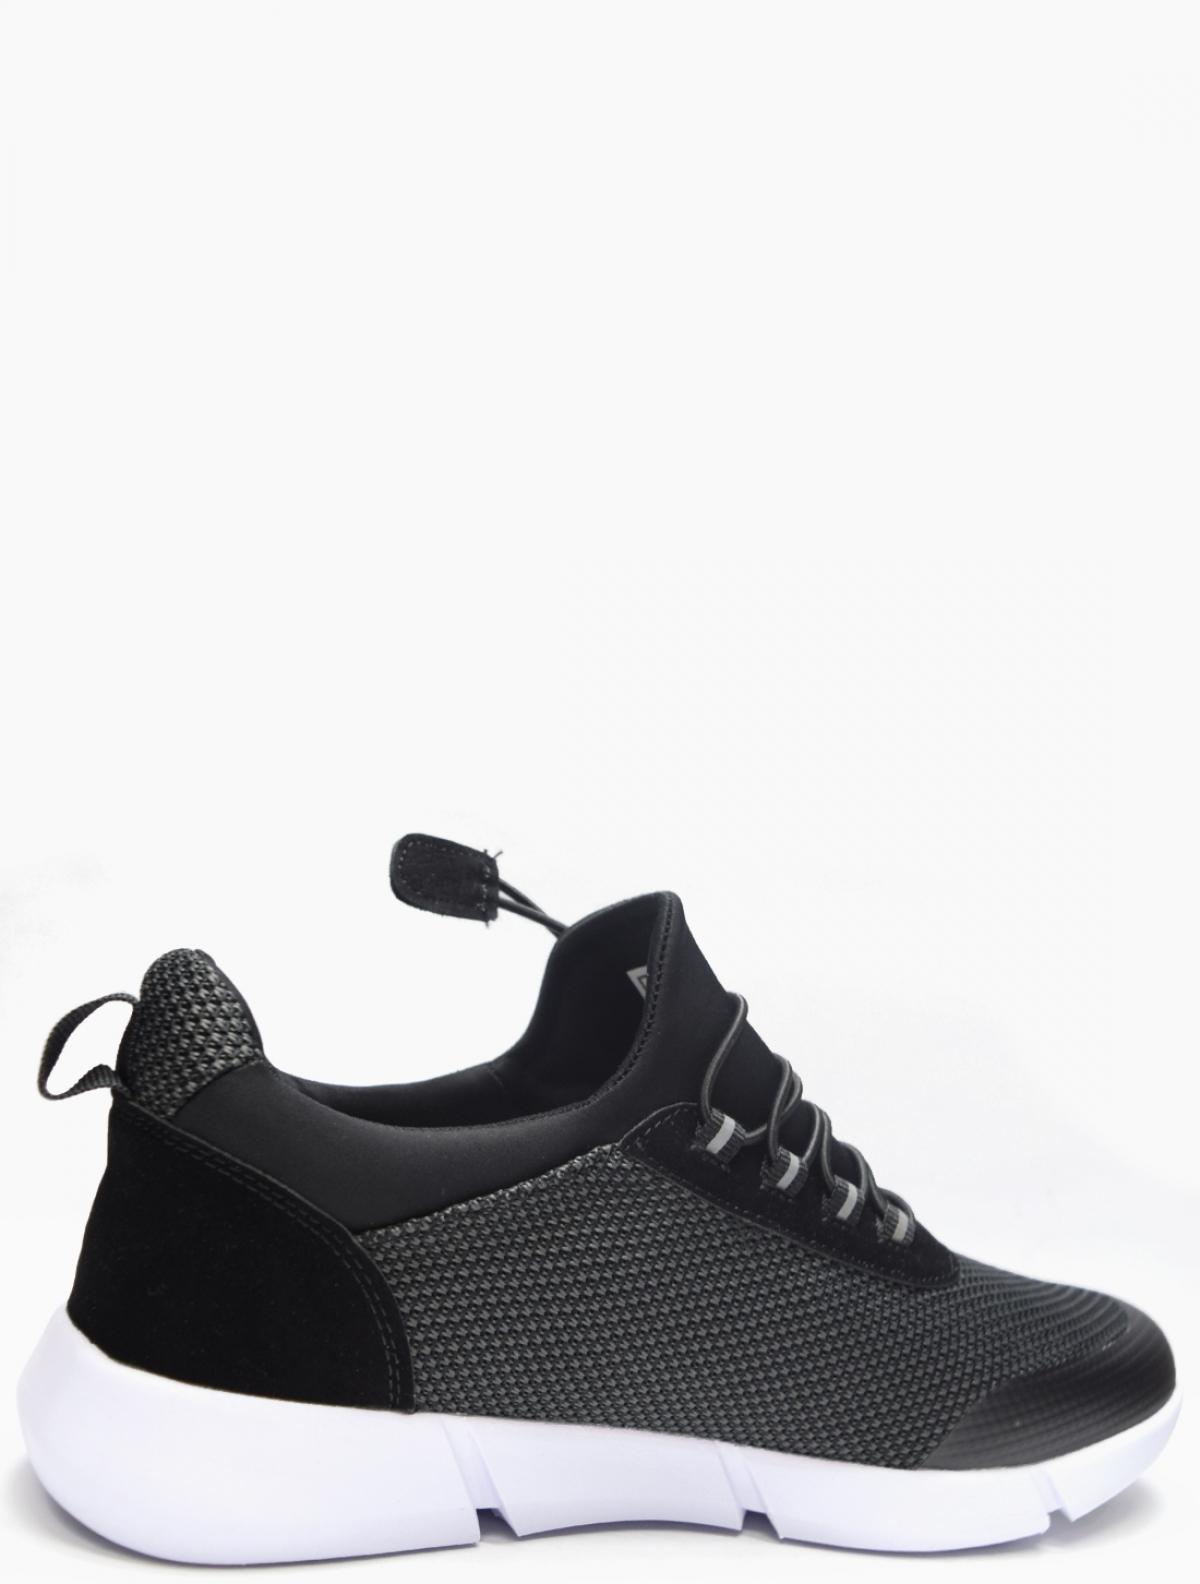 Зебра 13074-1 мужские кроссовки